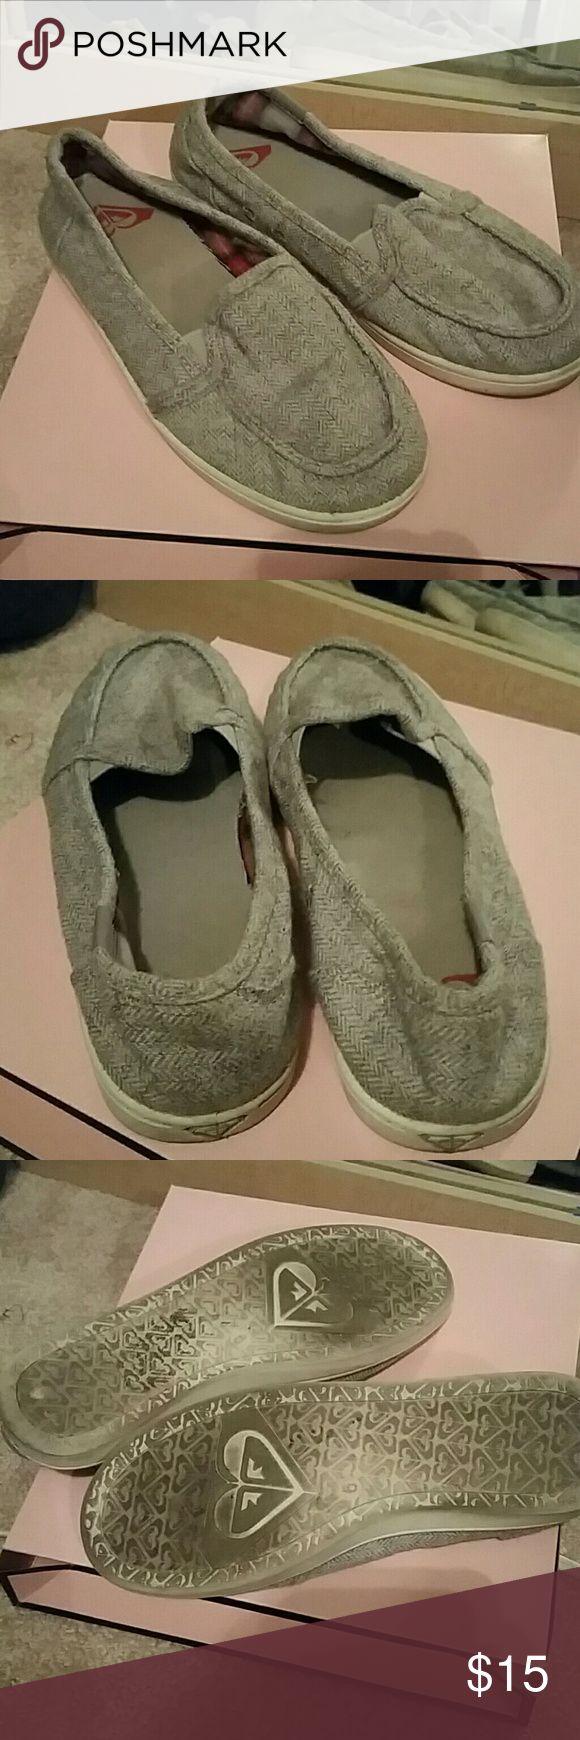 Roxy gray flat size 6 Gray flat with white rim Roxy Shoes Flats & Loafers